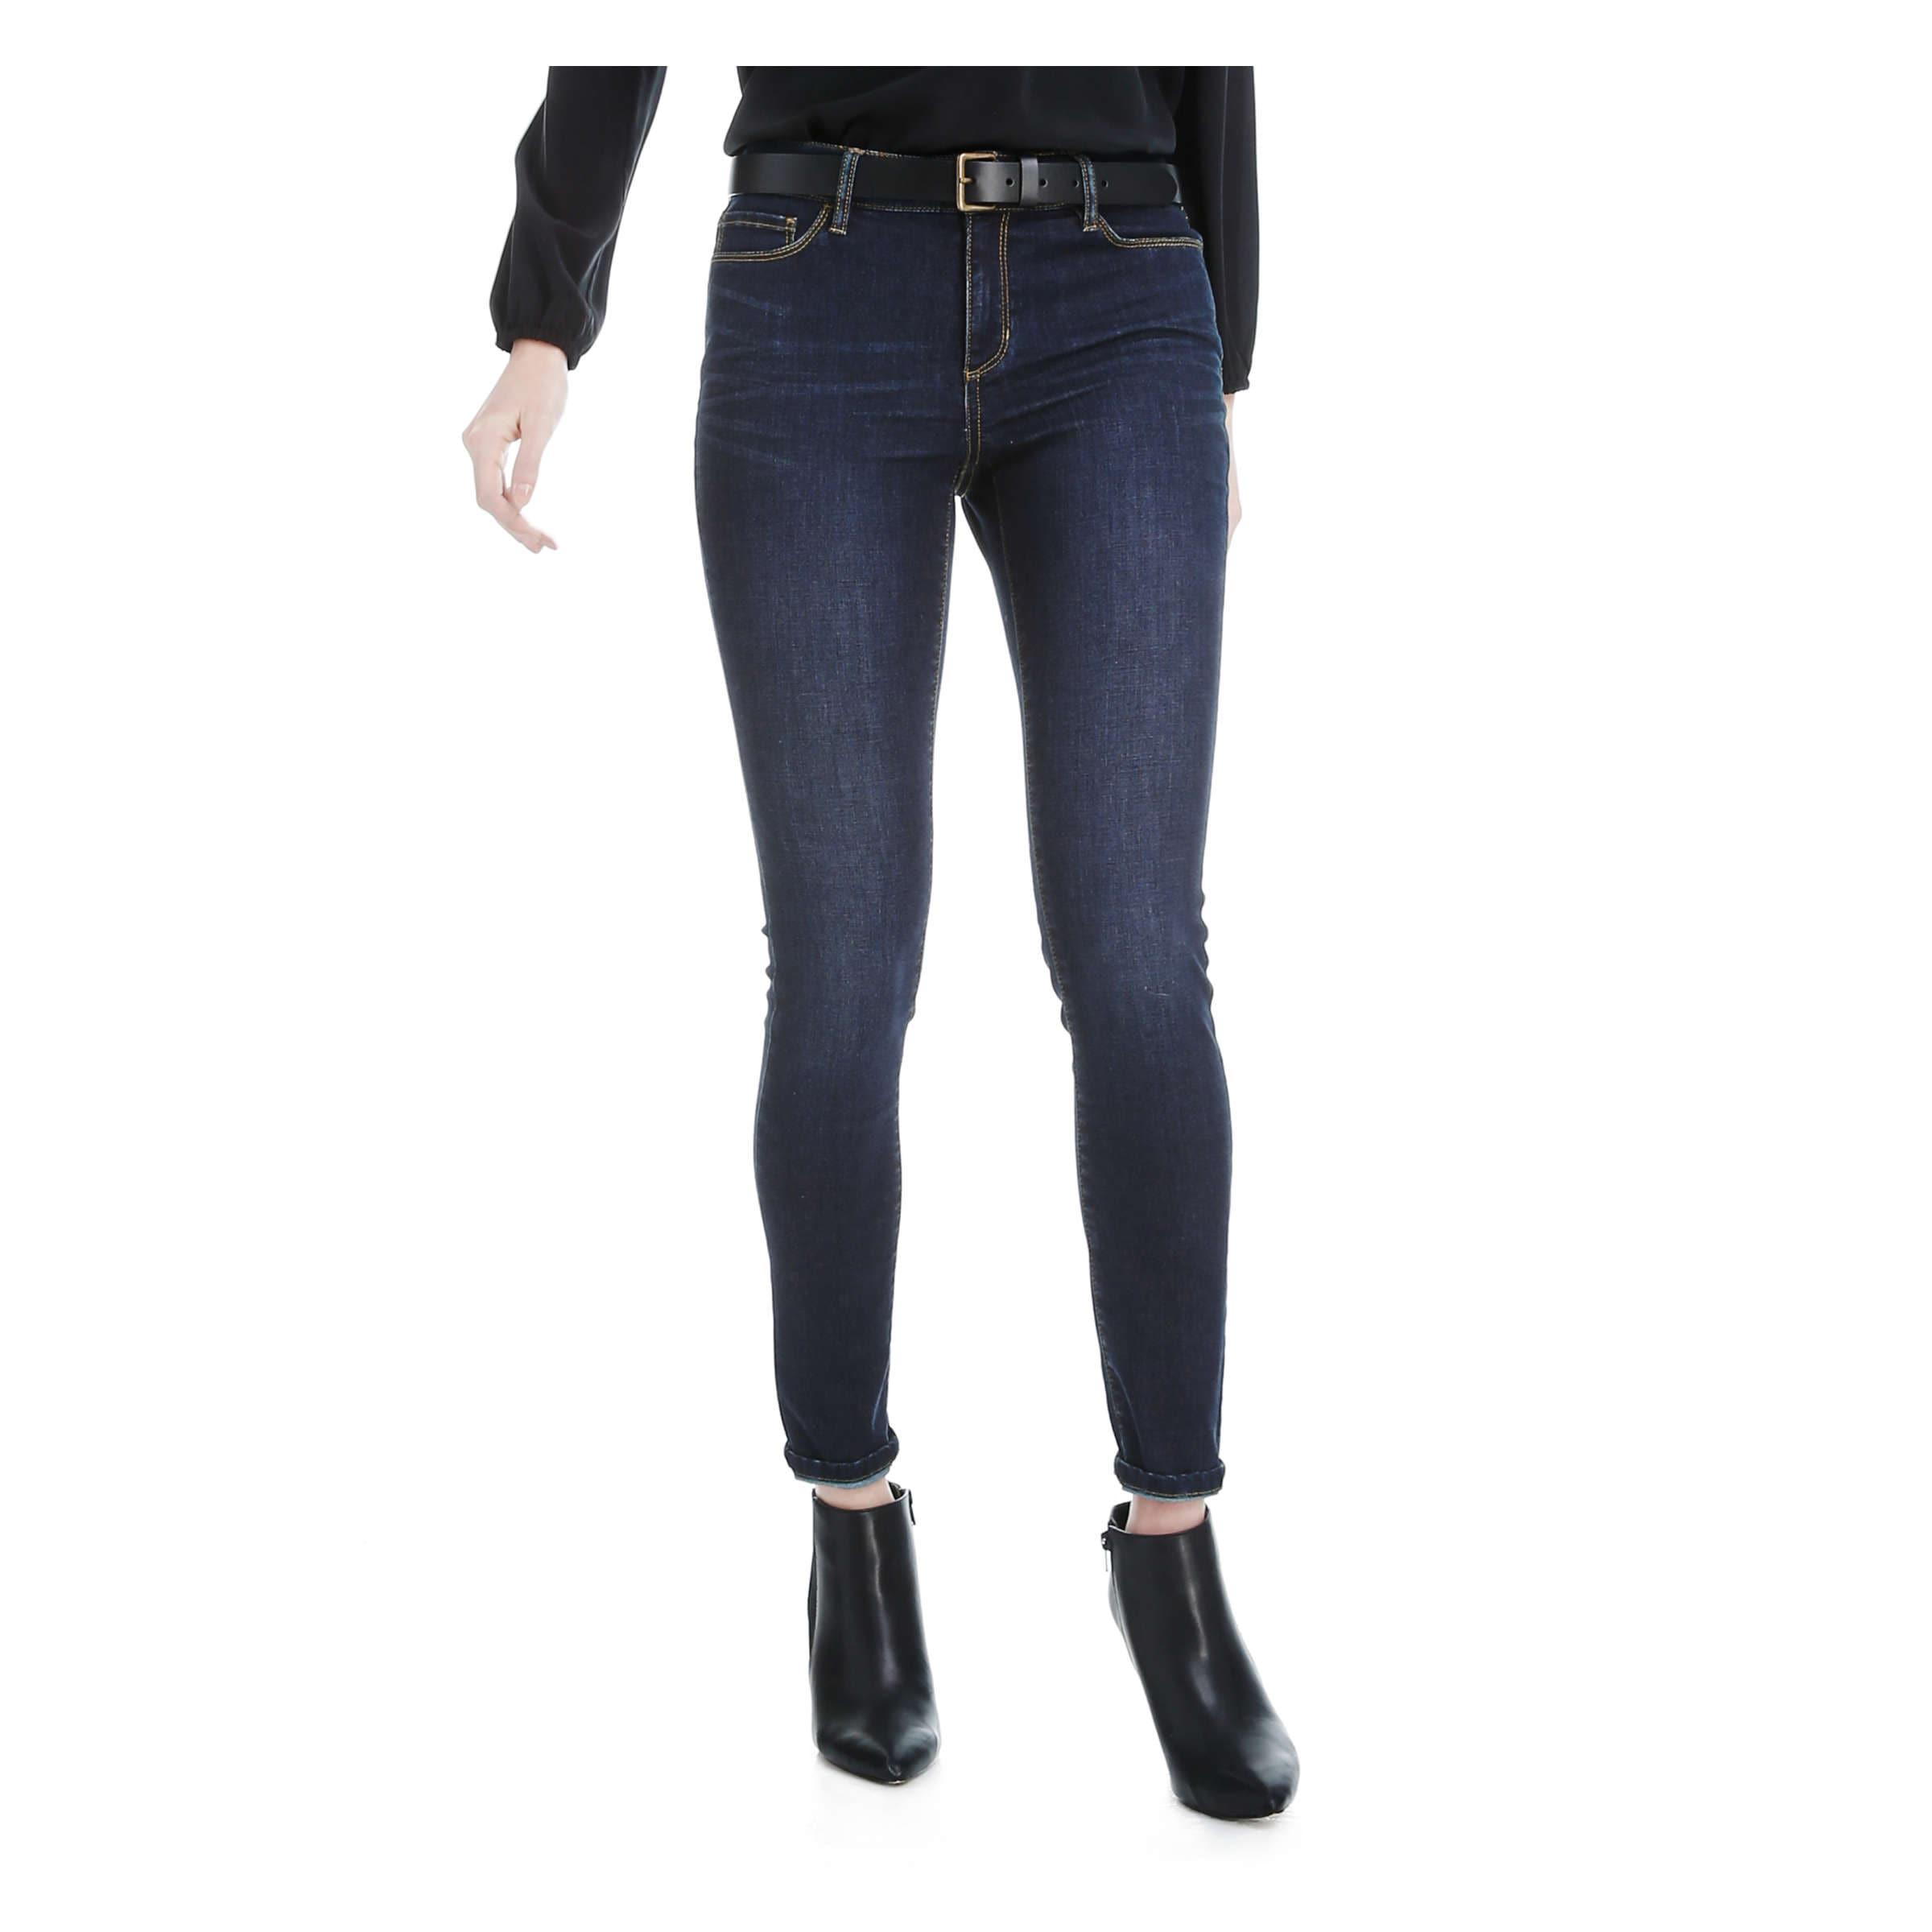 3a4652a85290 Ultra Slim Dark Jean in Dark Rinse from Joe Fresh